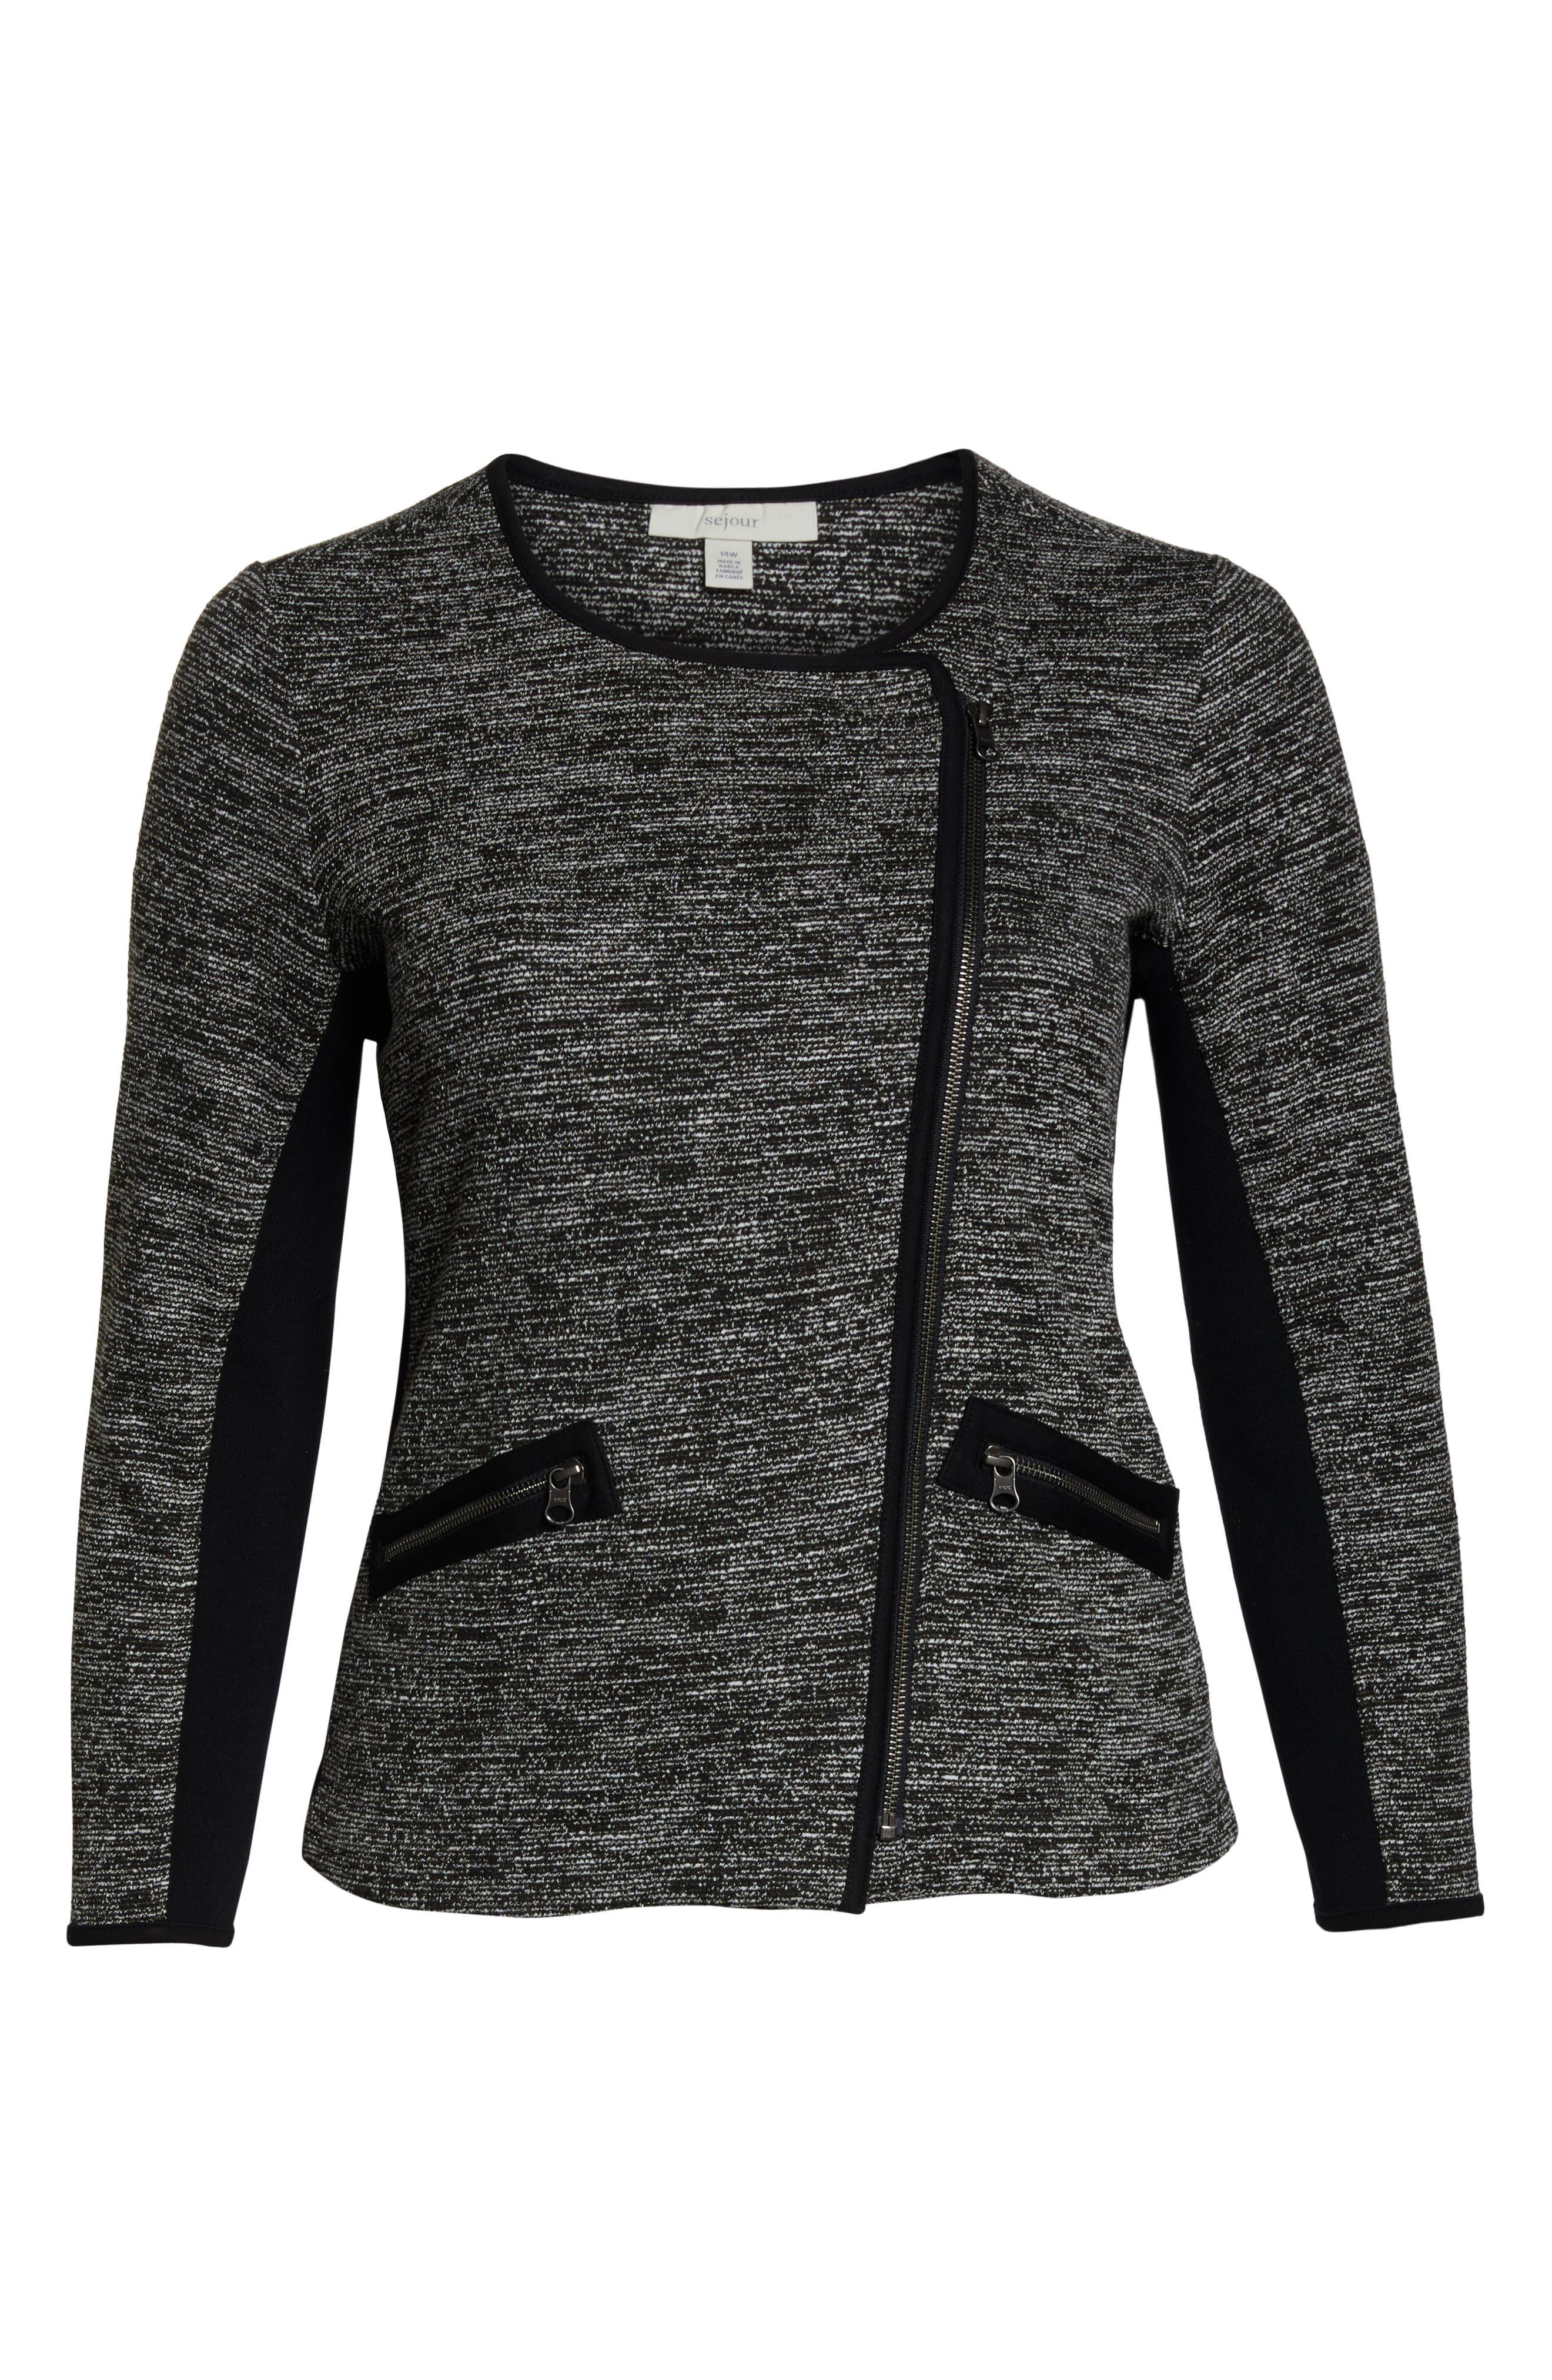 Mix Media Knit Jacket,                             Alternate thumbnail 5, color,                             BLACK TWEED